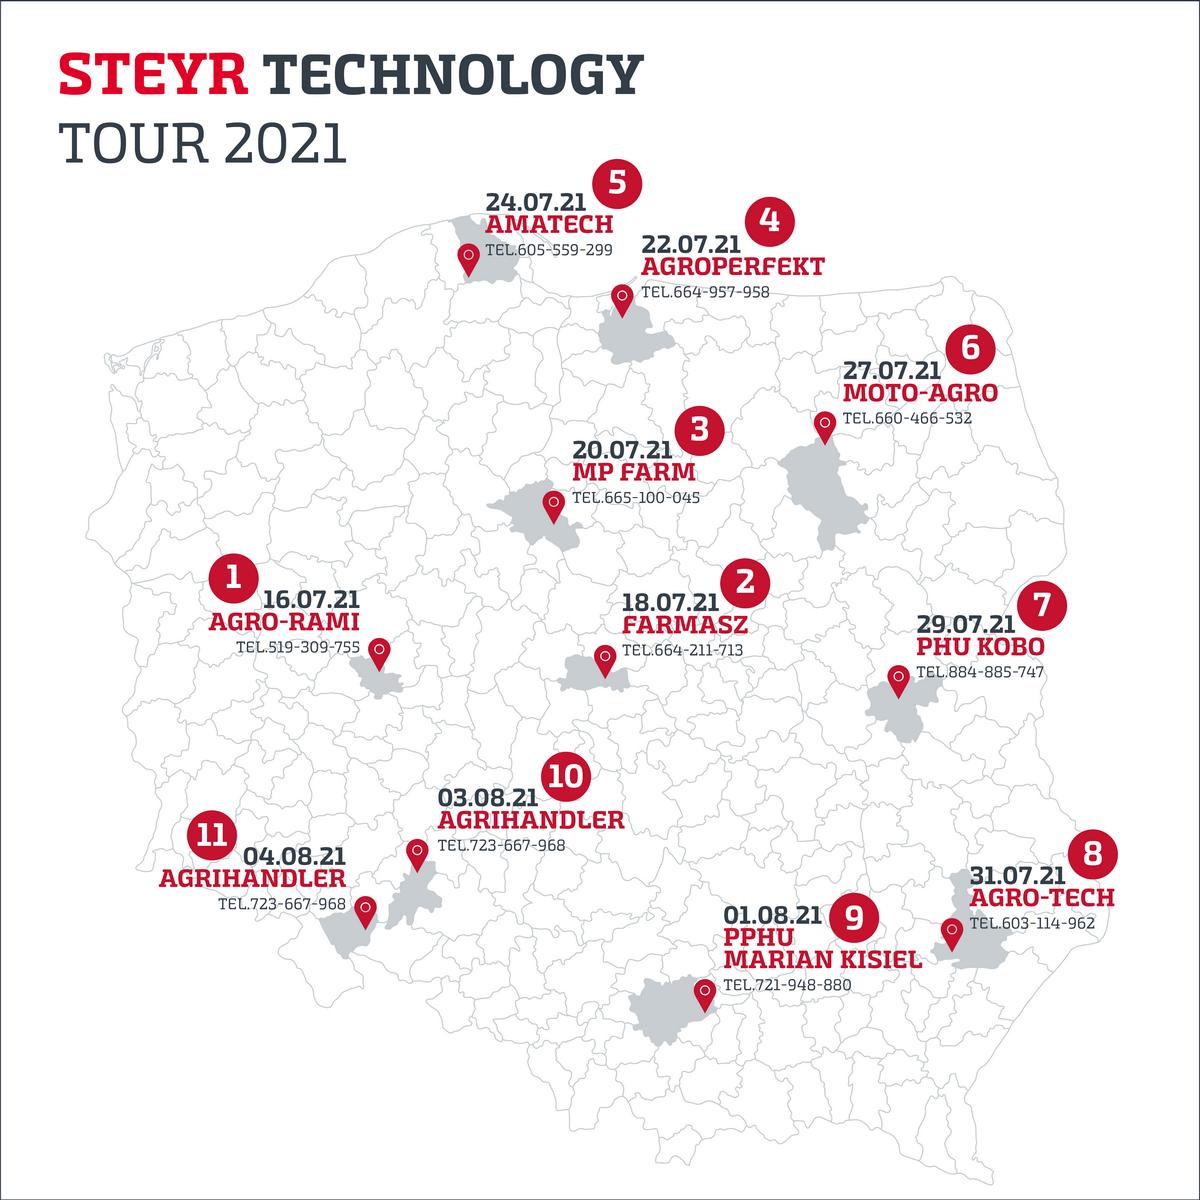 Steyr Demo Tour 2021 mapa Europejski Technology Tour 2021 marki STEYR rusza w Polskę